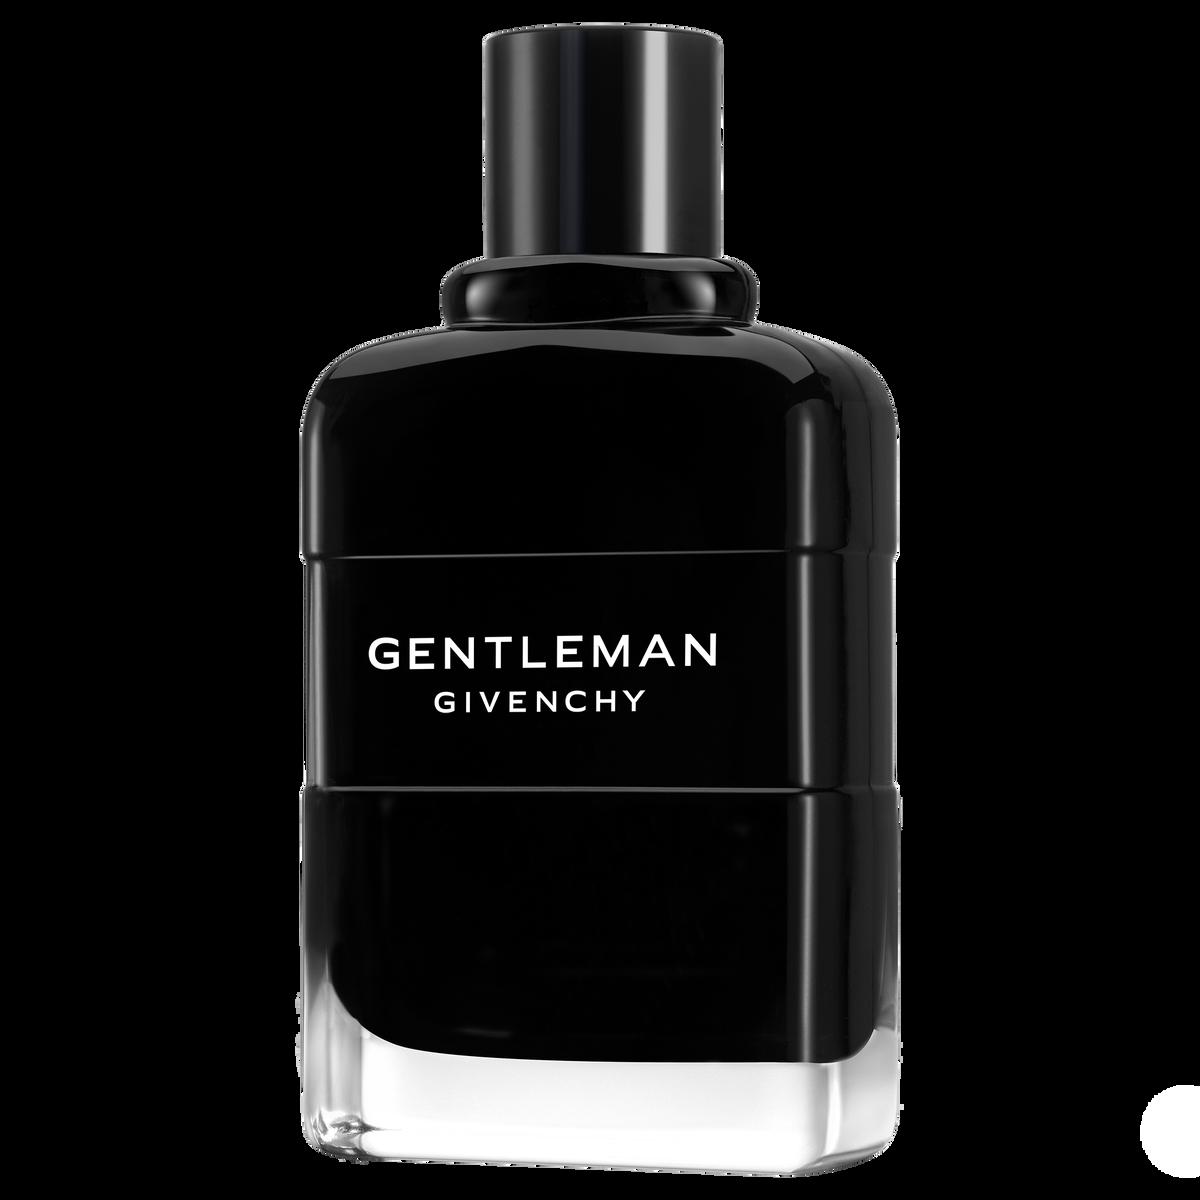 Gentleman Givenchy